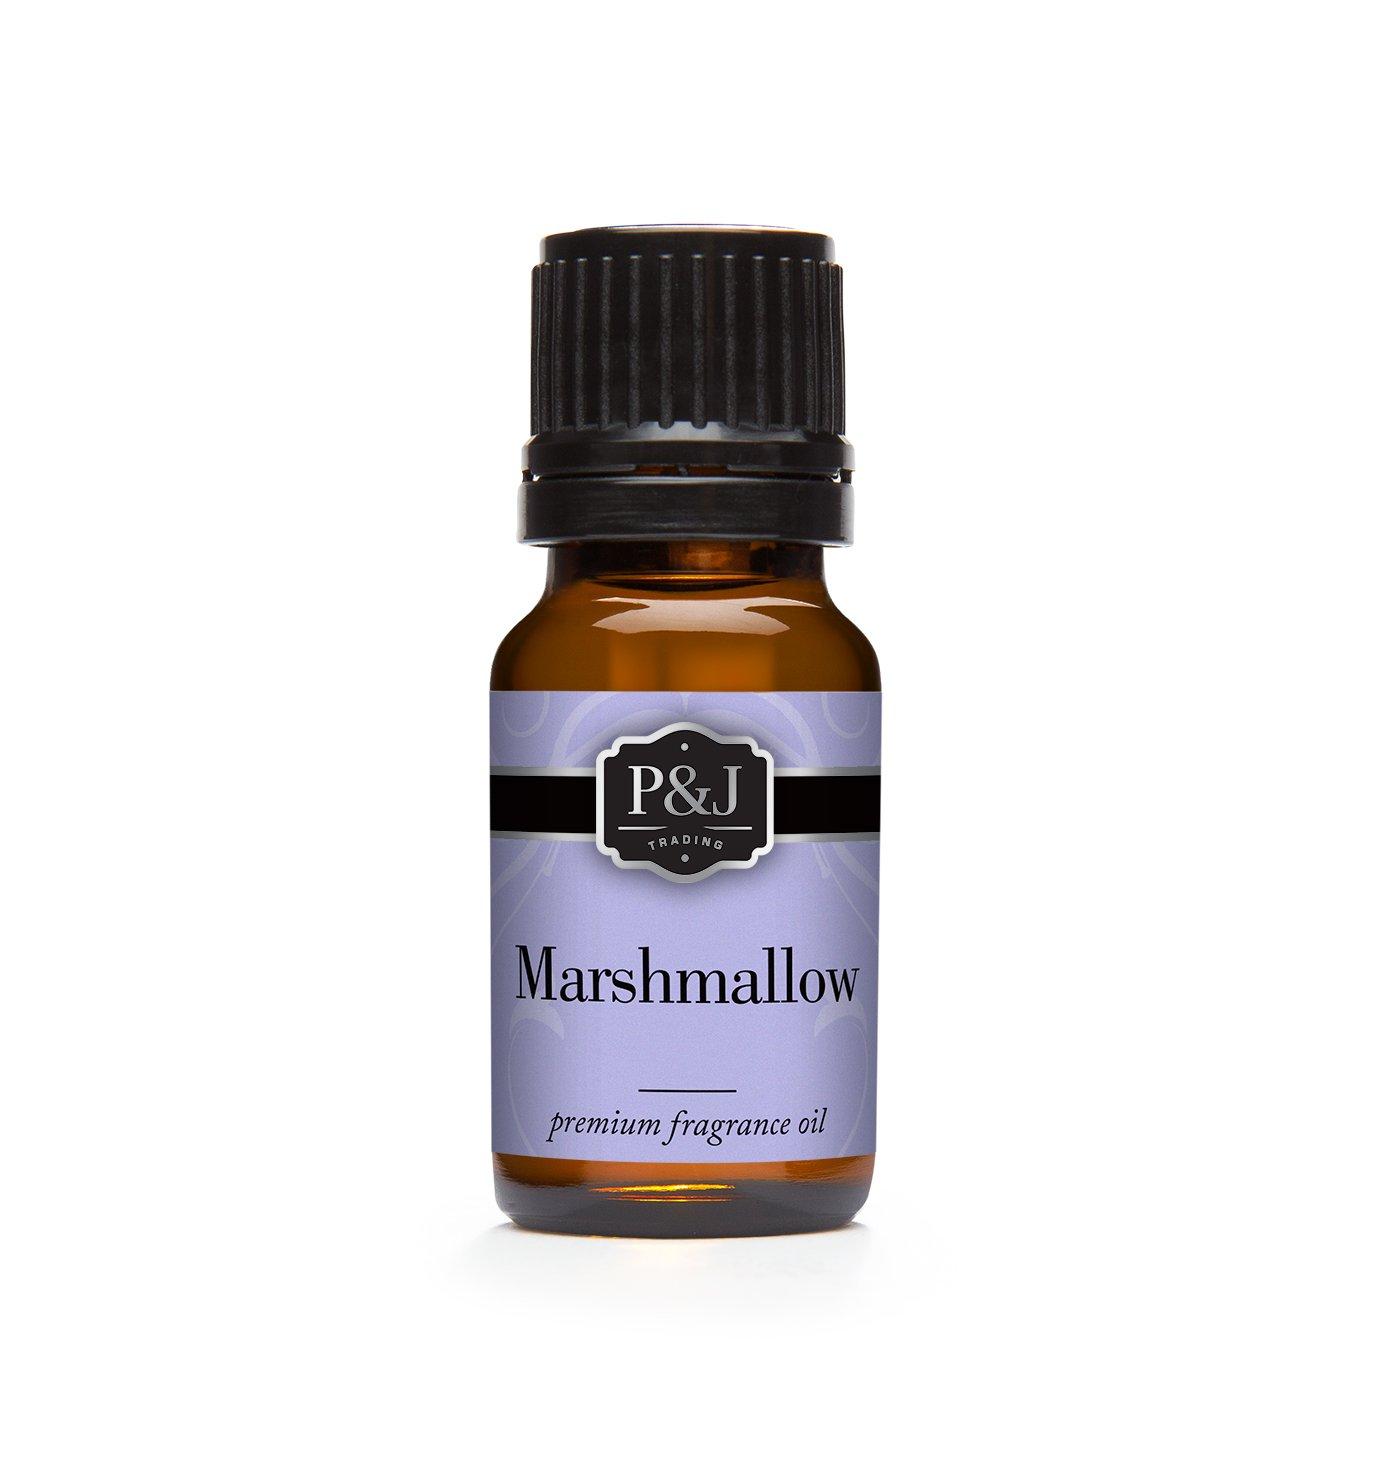 Marshmallow Fragrance Oil - Premium Grade Scented Oil - 10ml